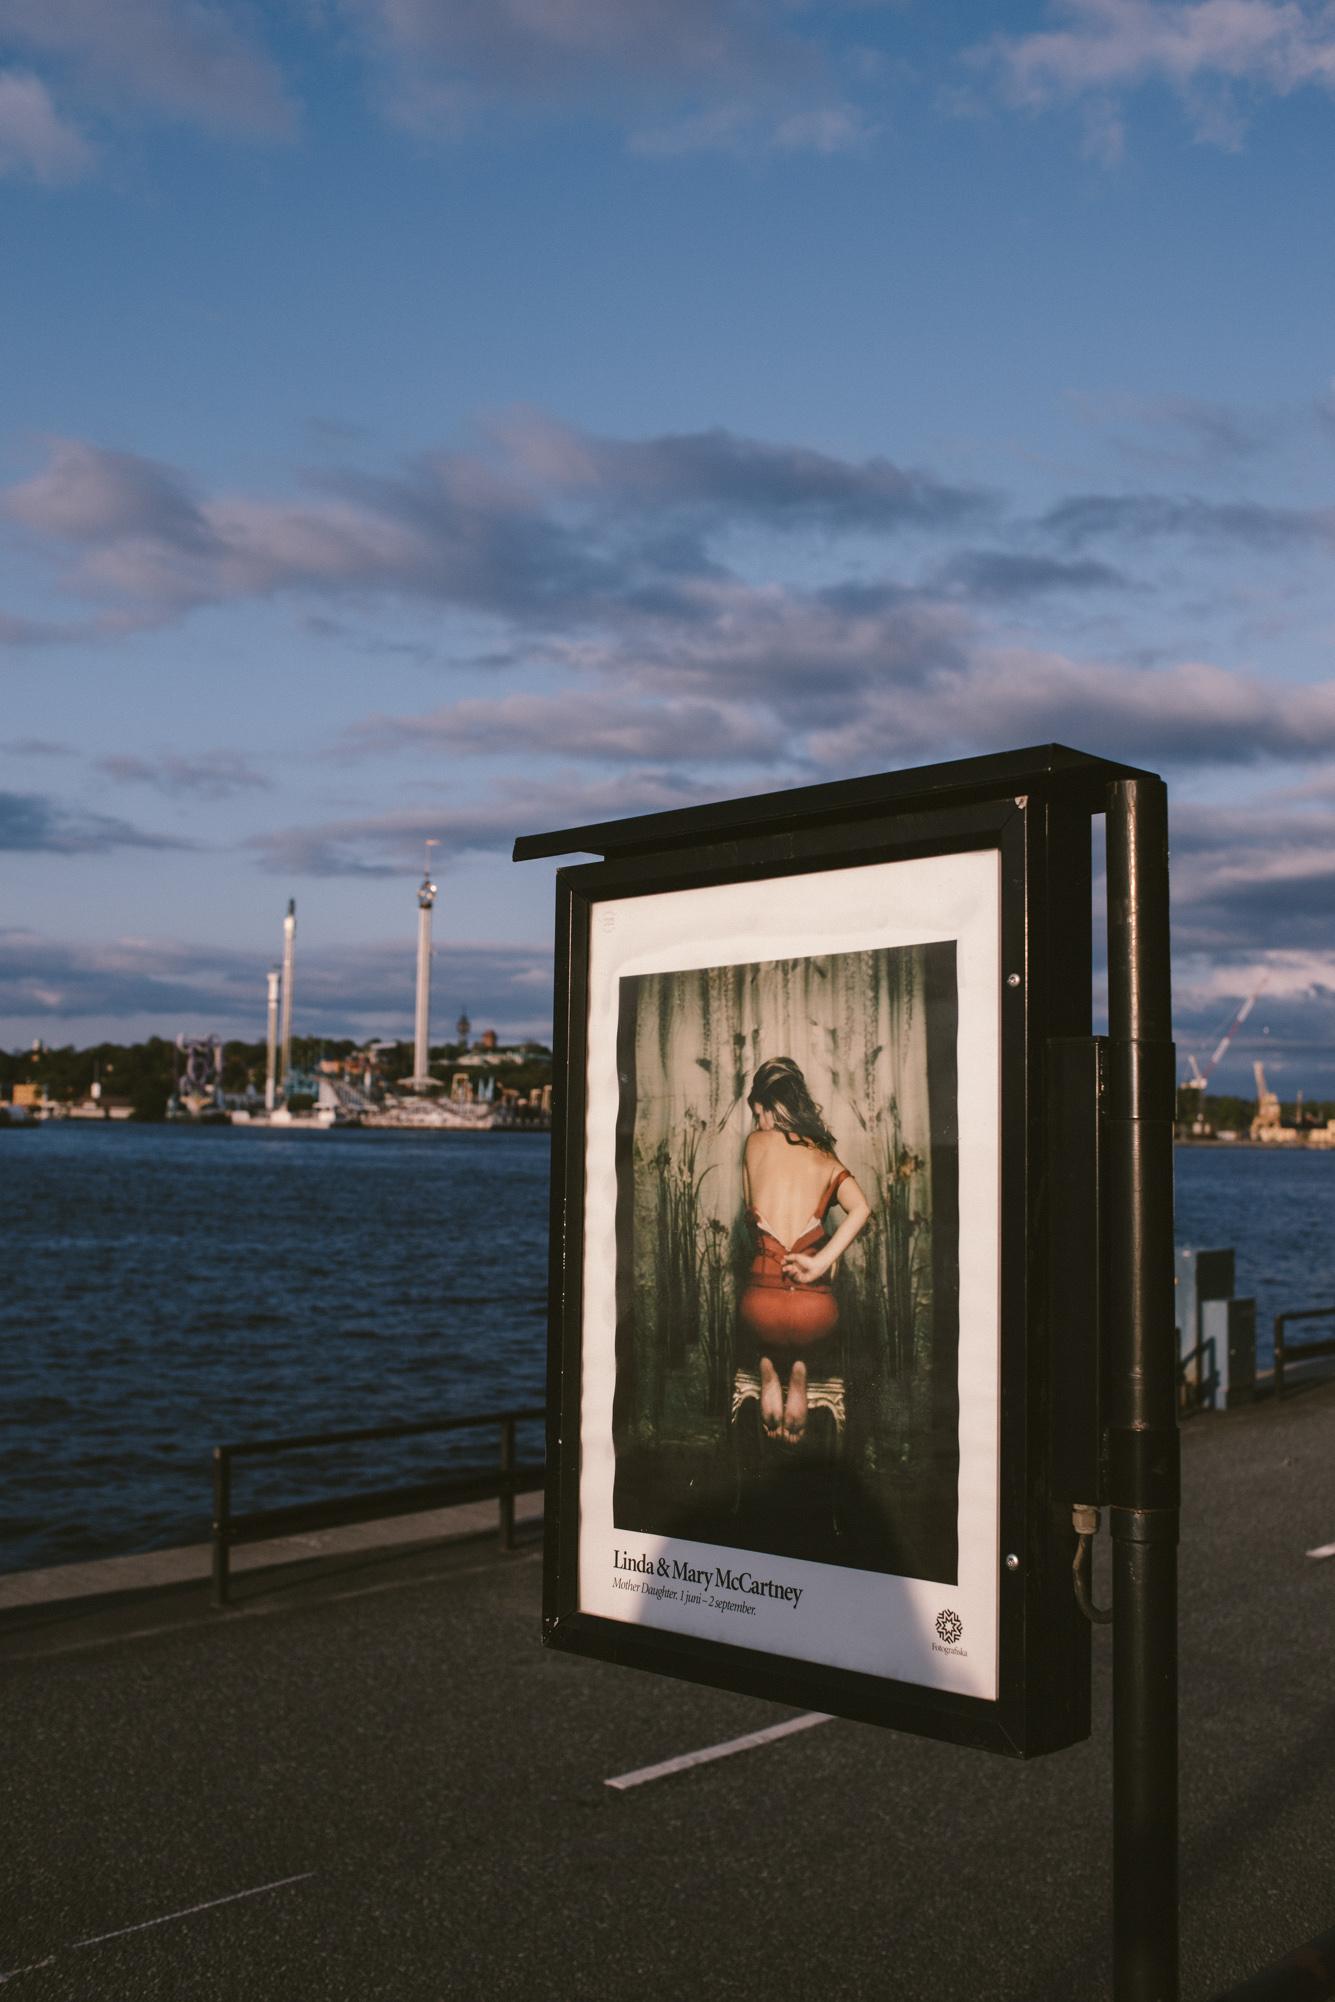 stockholm-kids-cityguide-conbotasdeagua-22.jpg